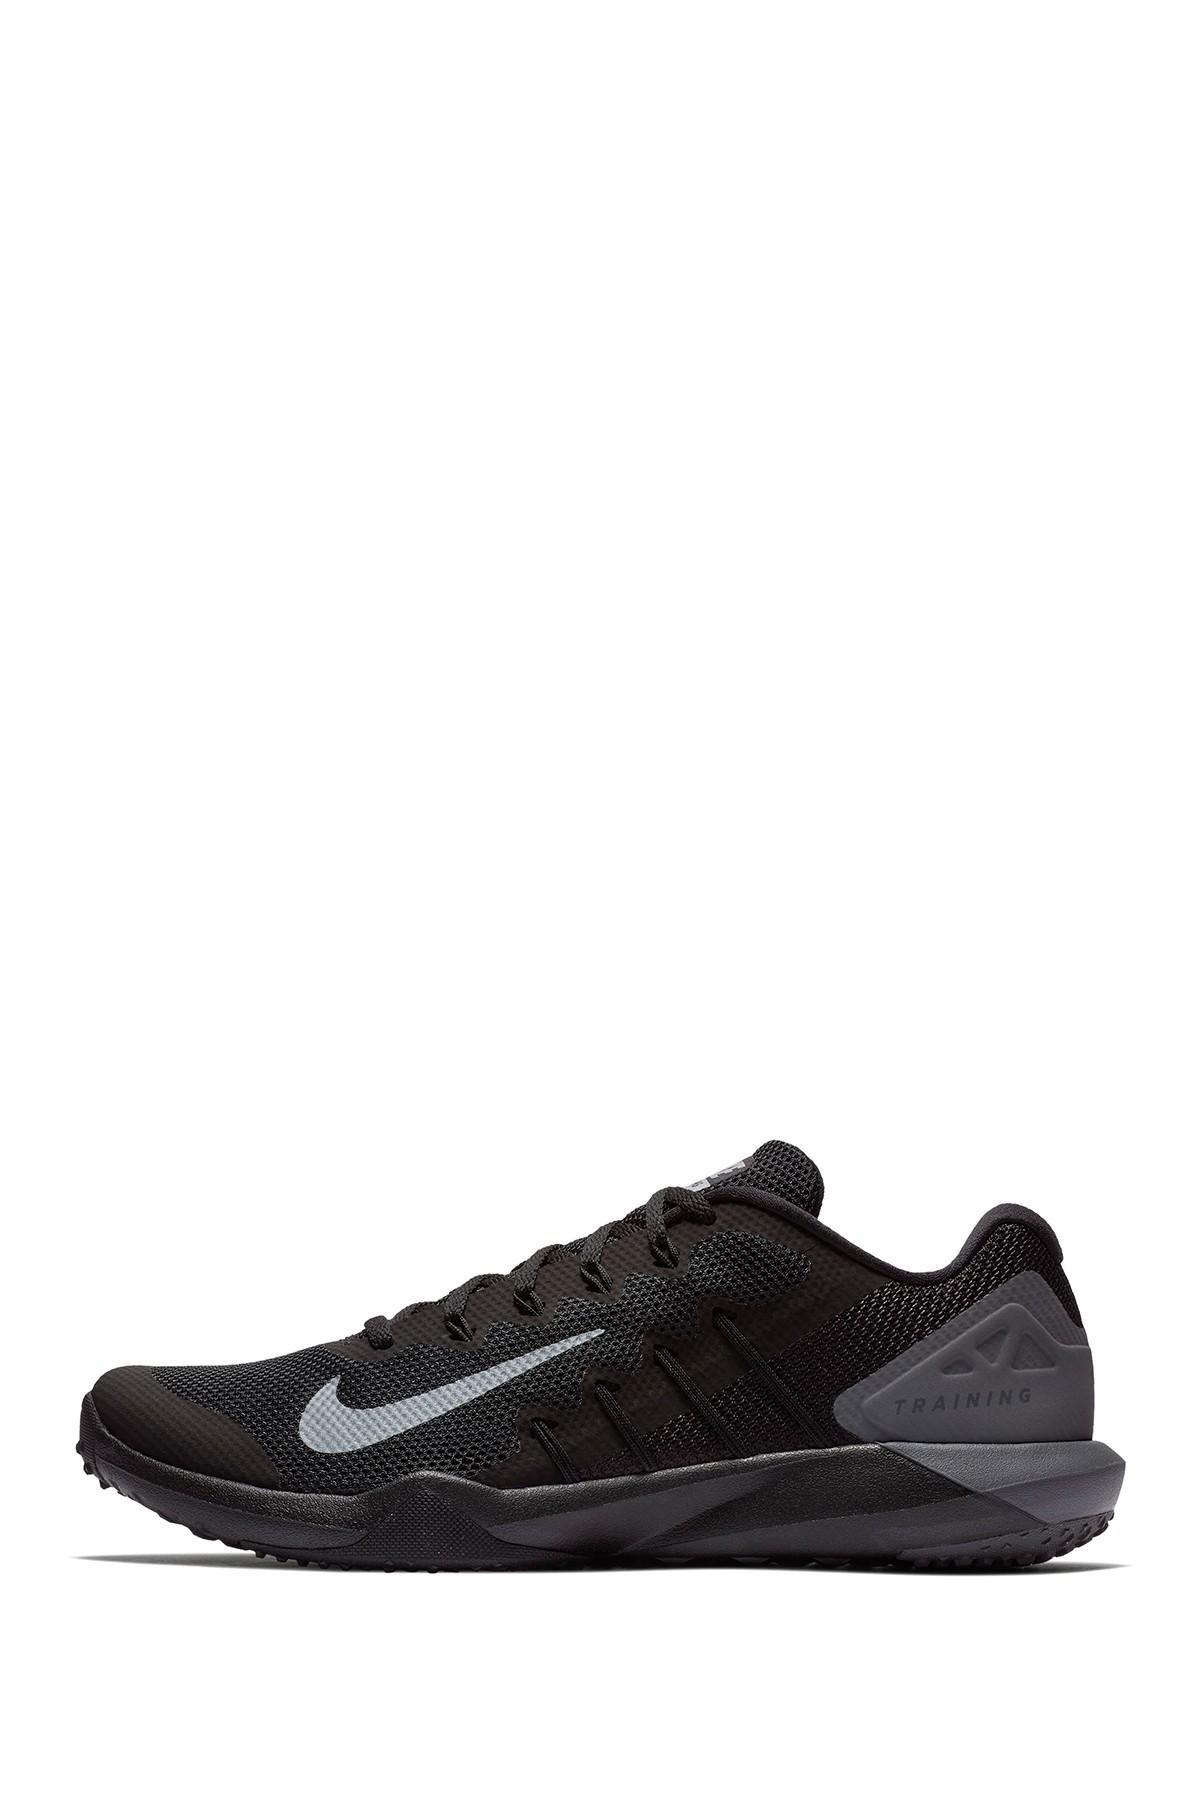 nike retaliation tr 2 men's training shoes